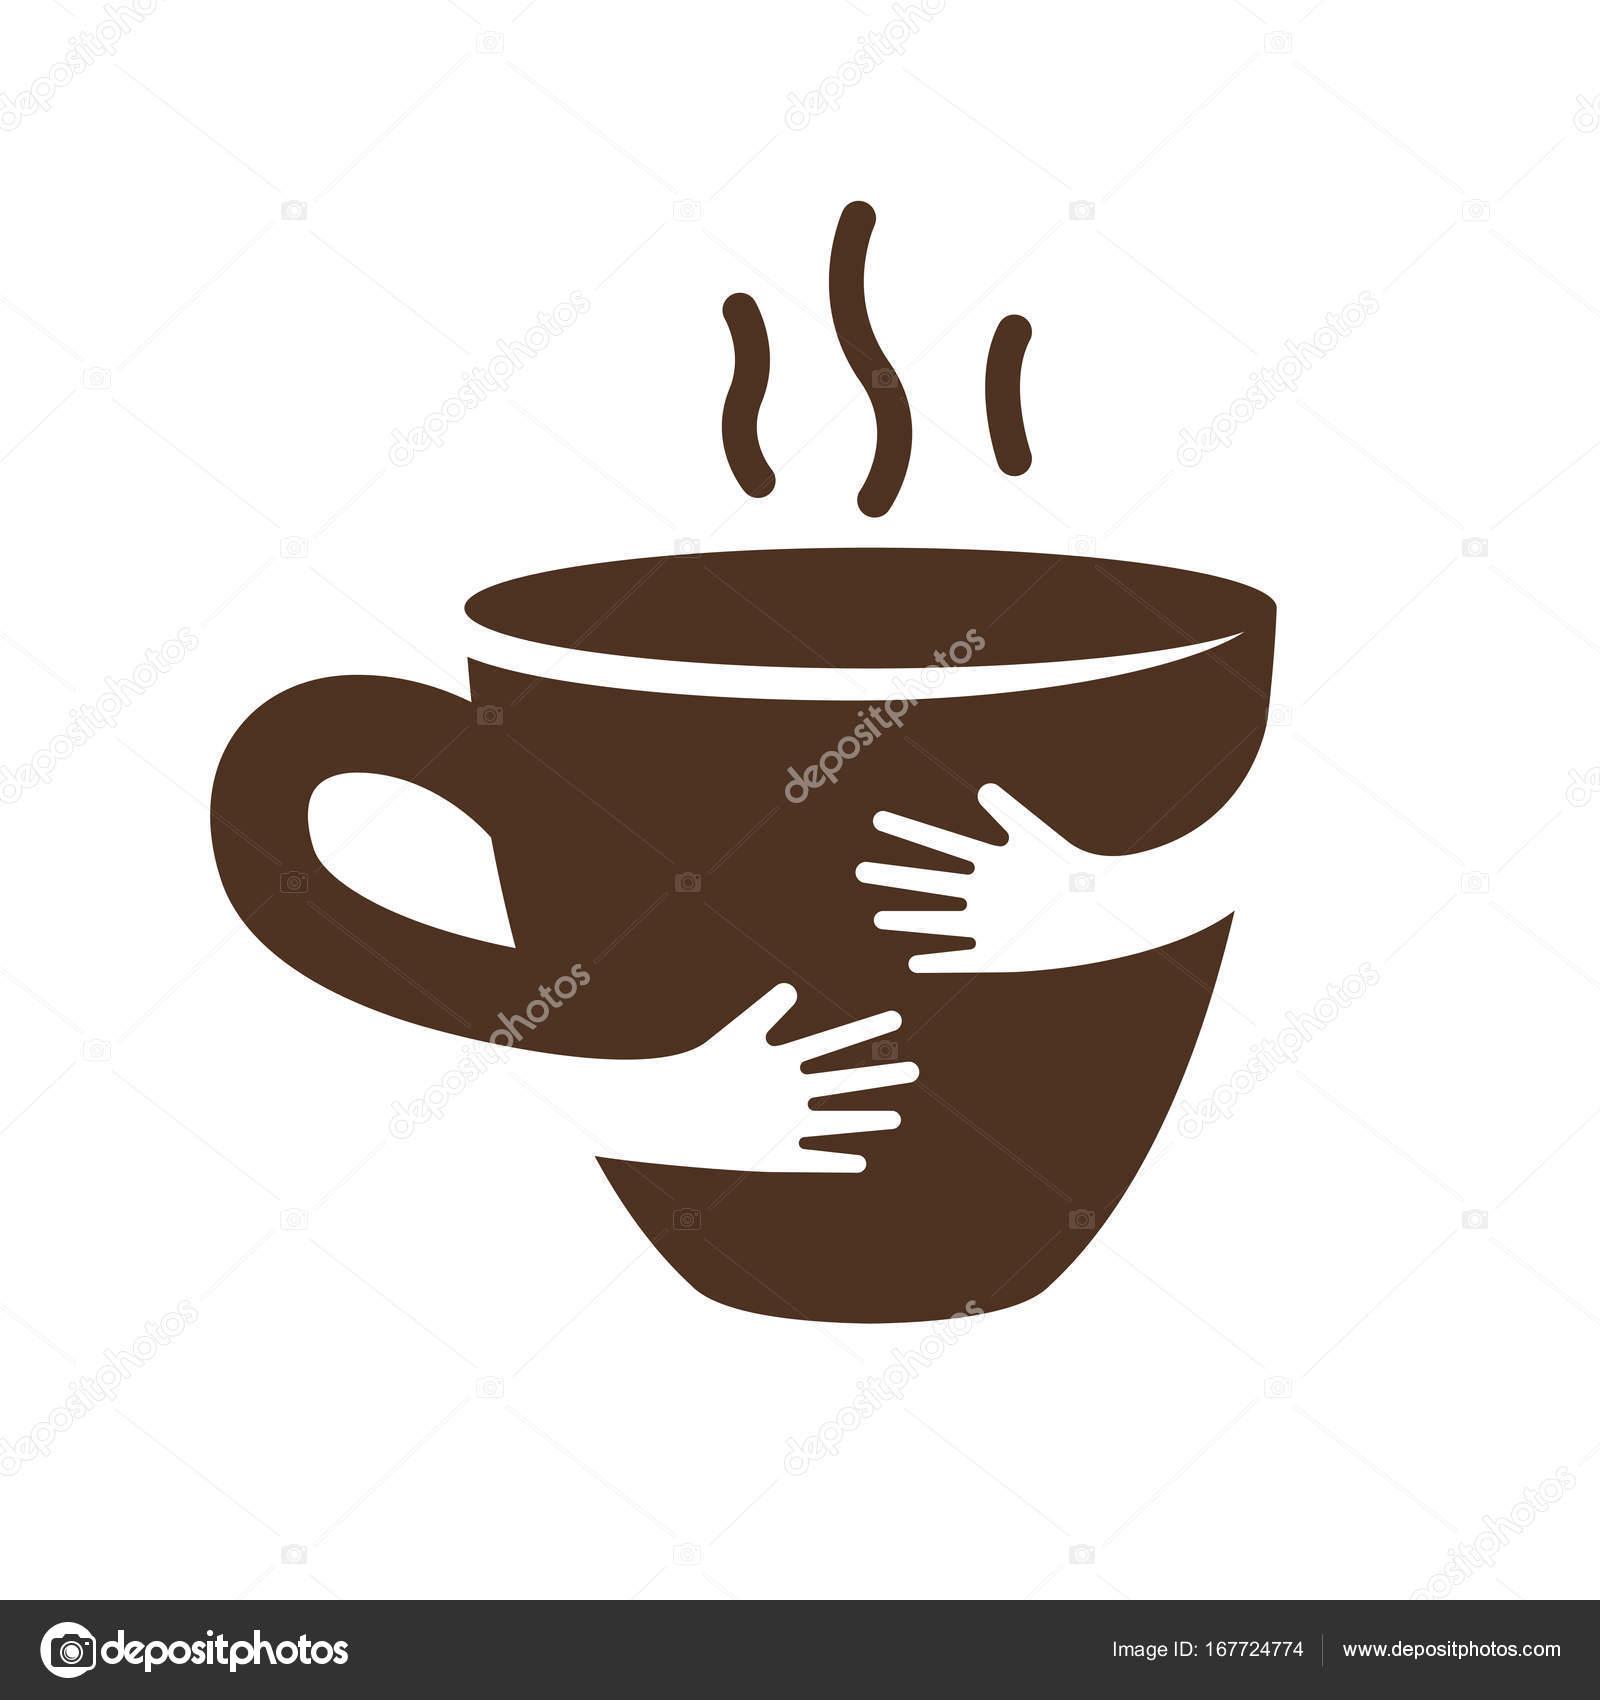 Creative Coffee Or Tea Cup And Hands Logo Design Cafe Or Restaurant Symbol Unique Logotype Design Template Hug Hot Cup Vector Illustration Stock Vector C Plahotya 167724774